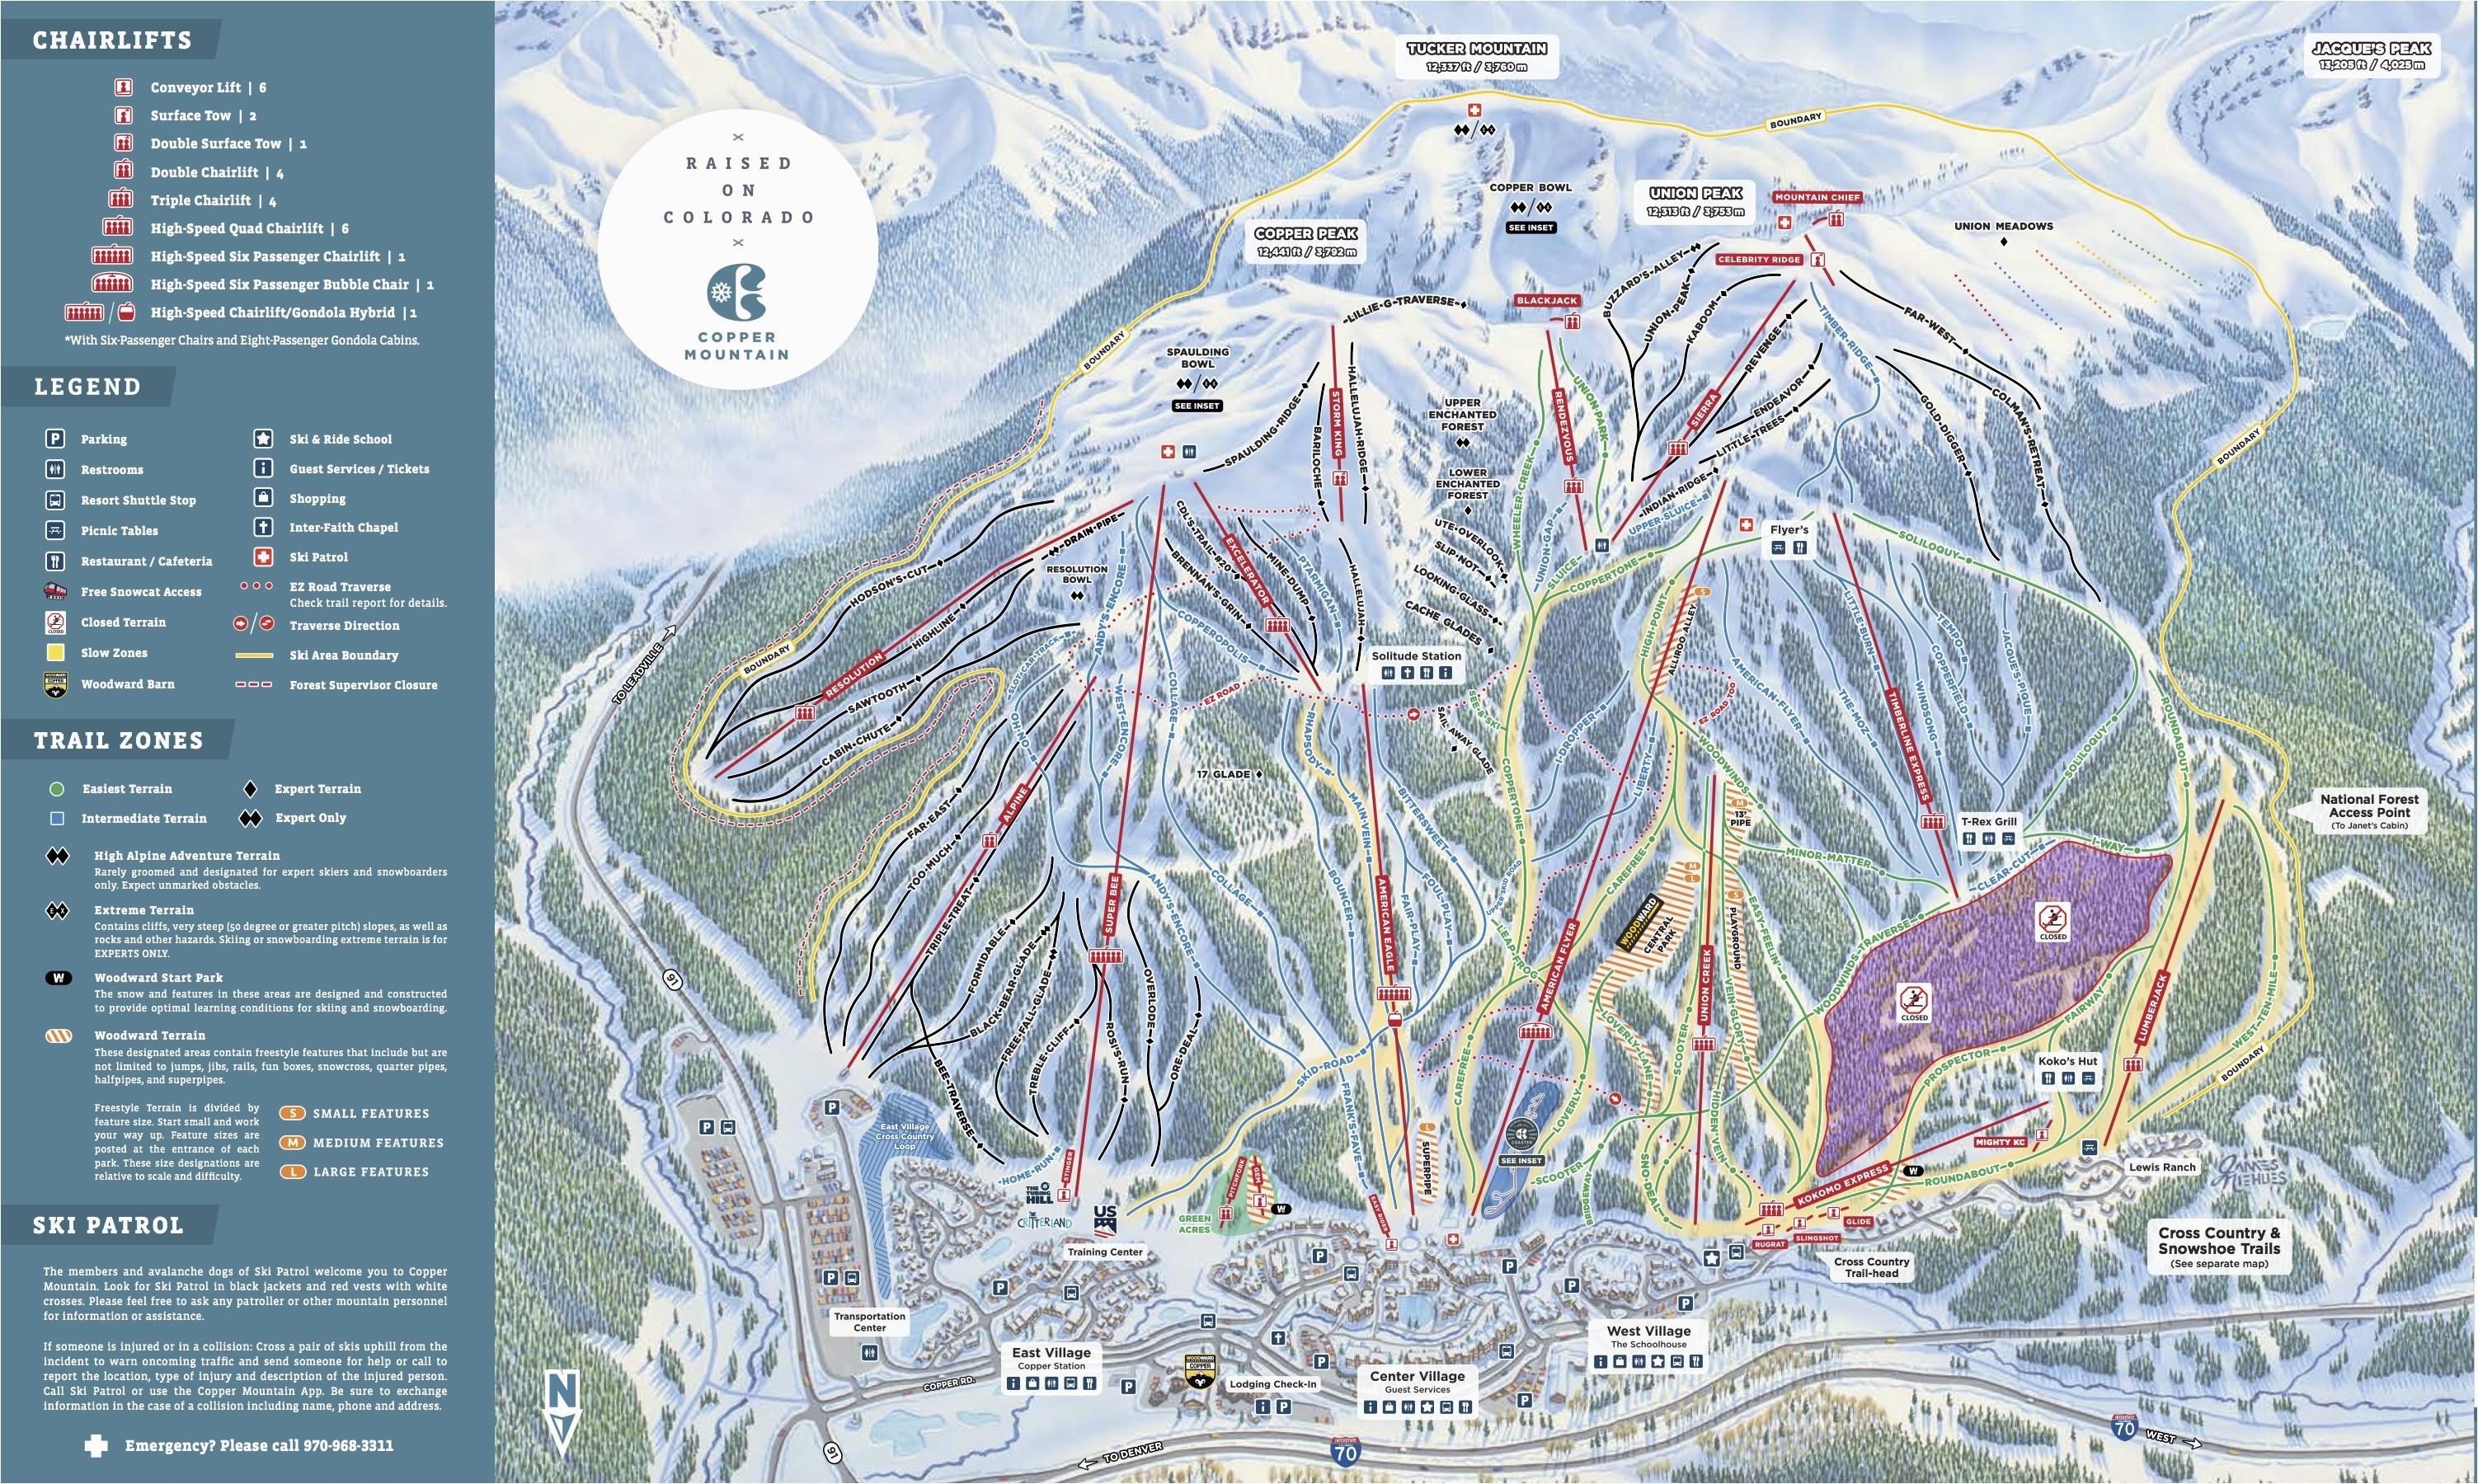 Steamboat Colorado Trail Map Copper Mountain Resort Trail ...